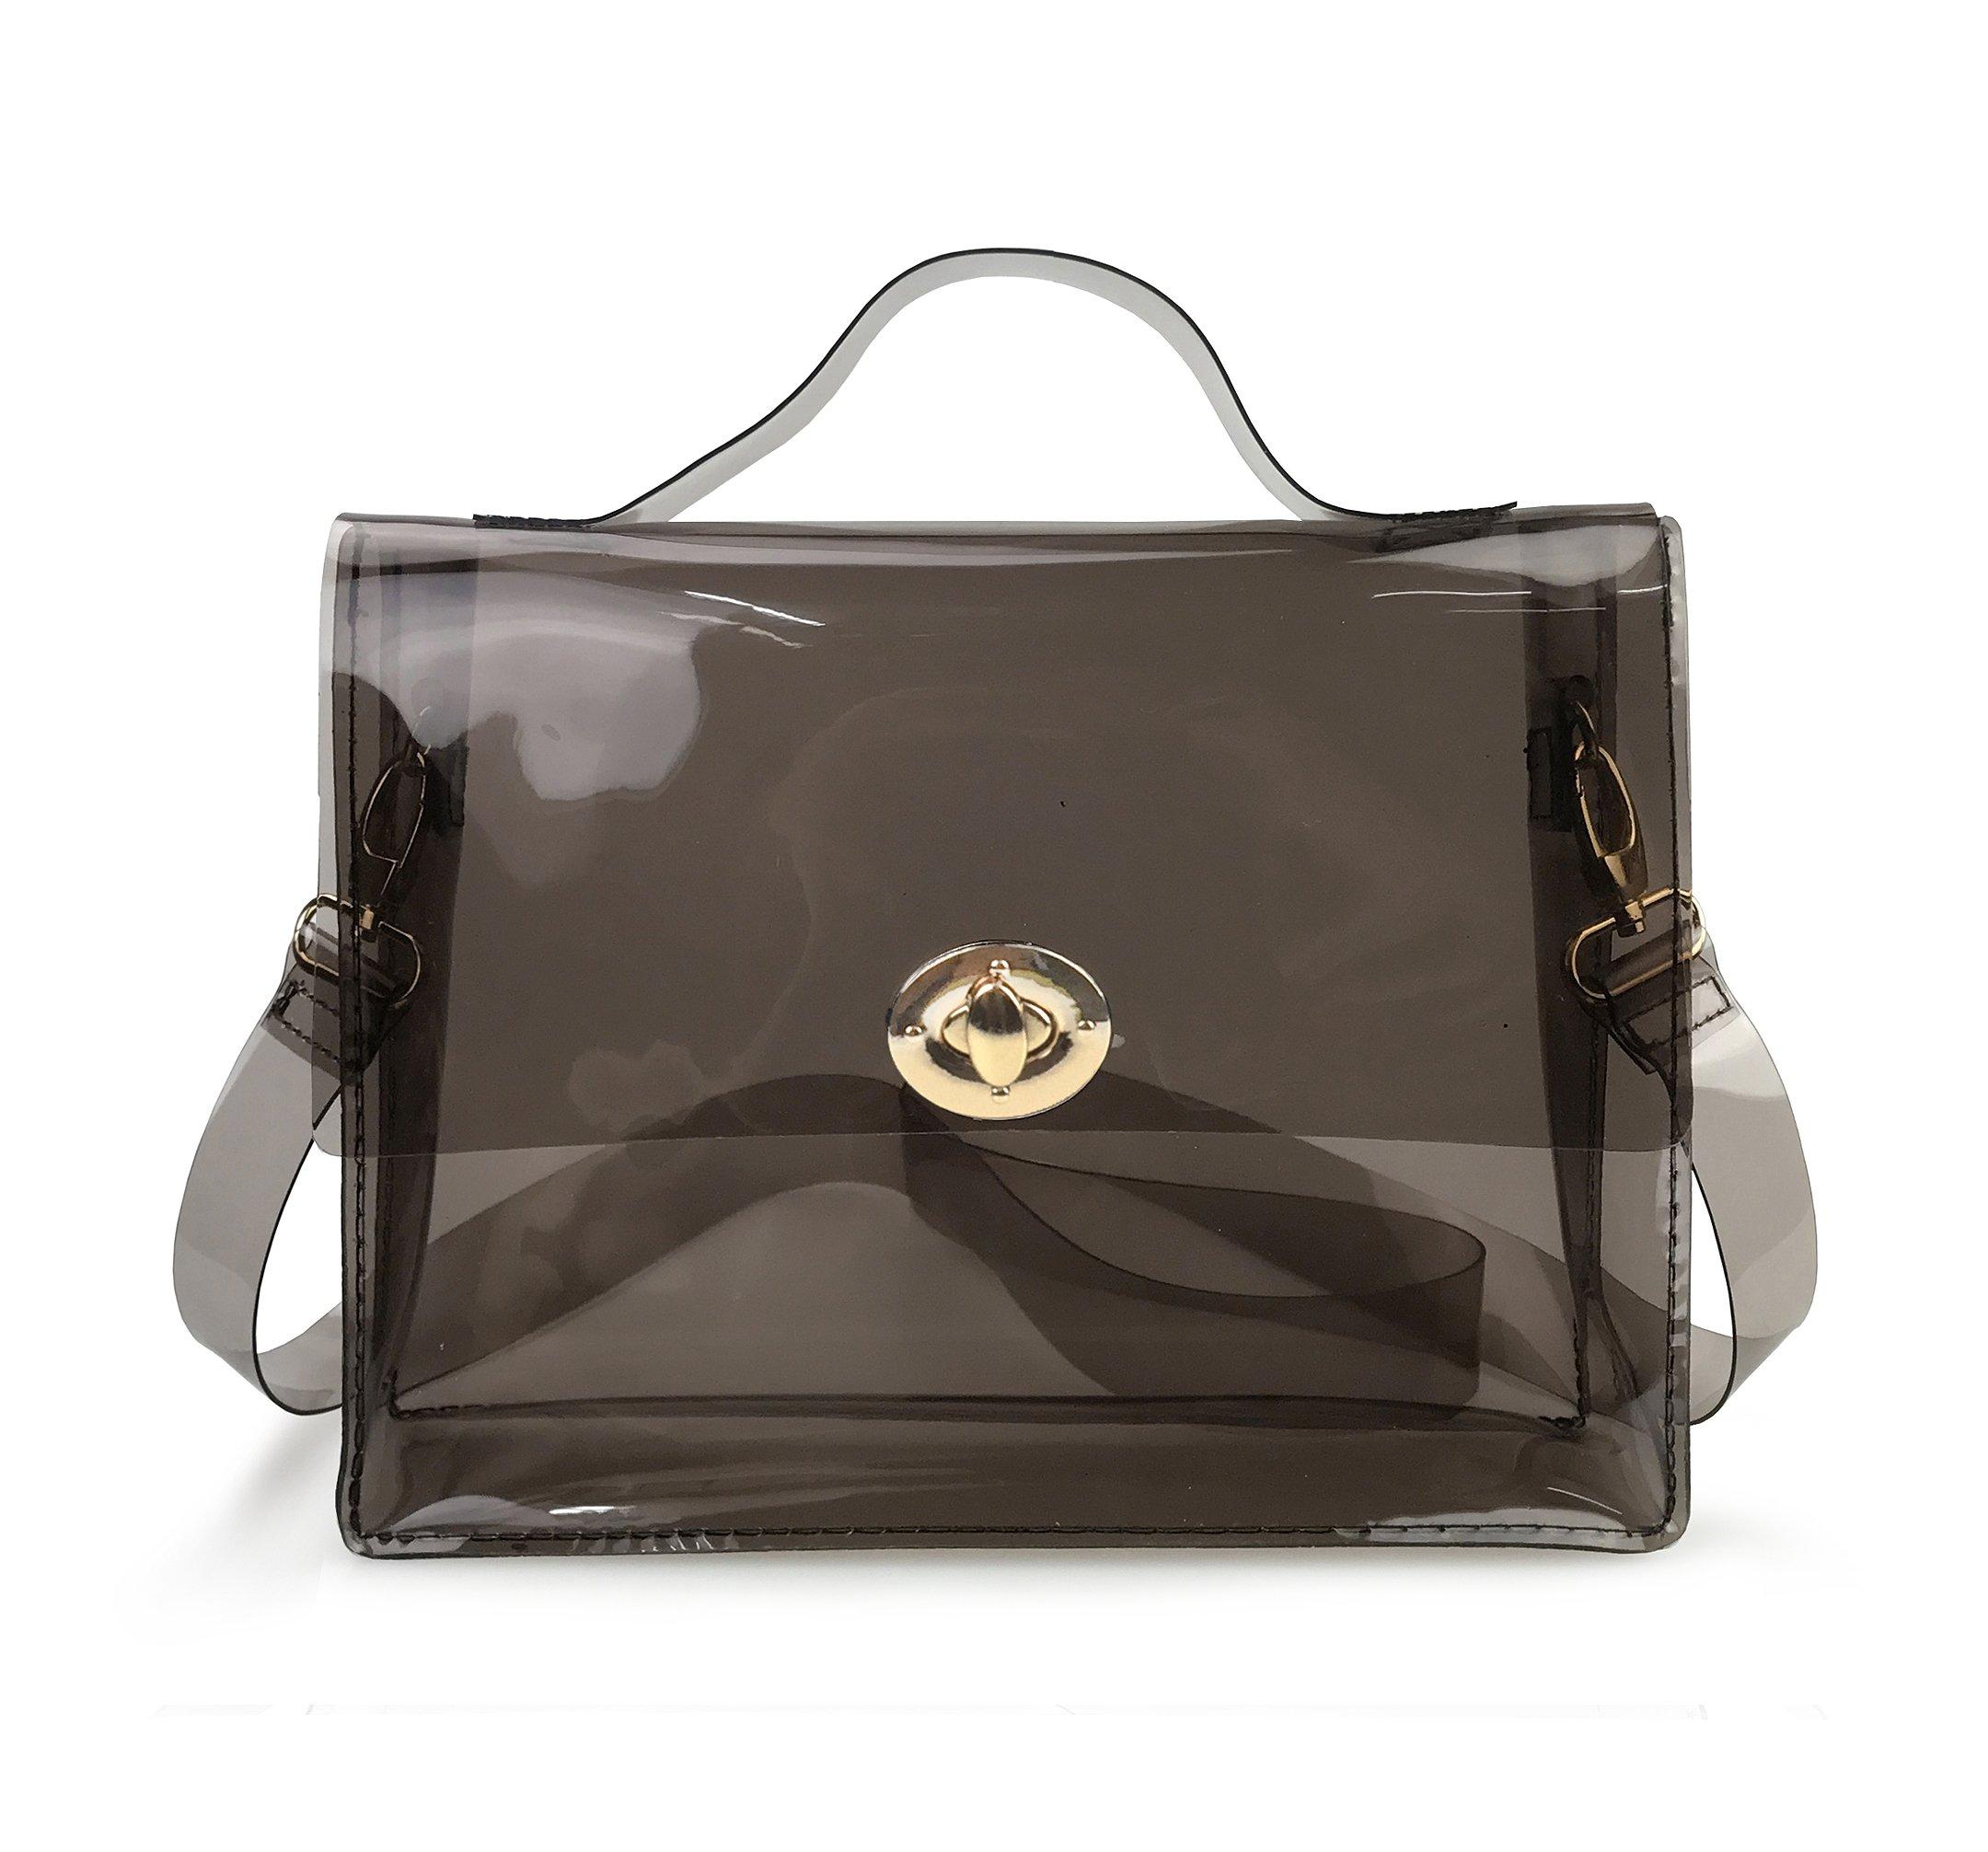 Hoxis Summer Beach Clear PVC Turn Lock Satchel Cross Body Bag DIY Decor Transparent Messenger Handbag (Smoke Gray)